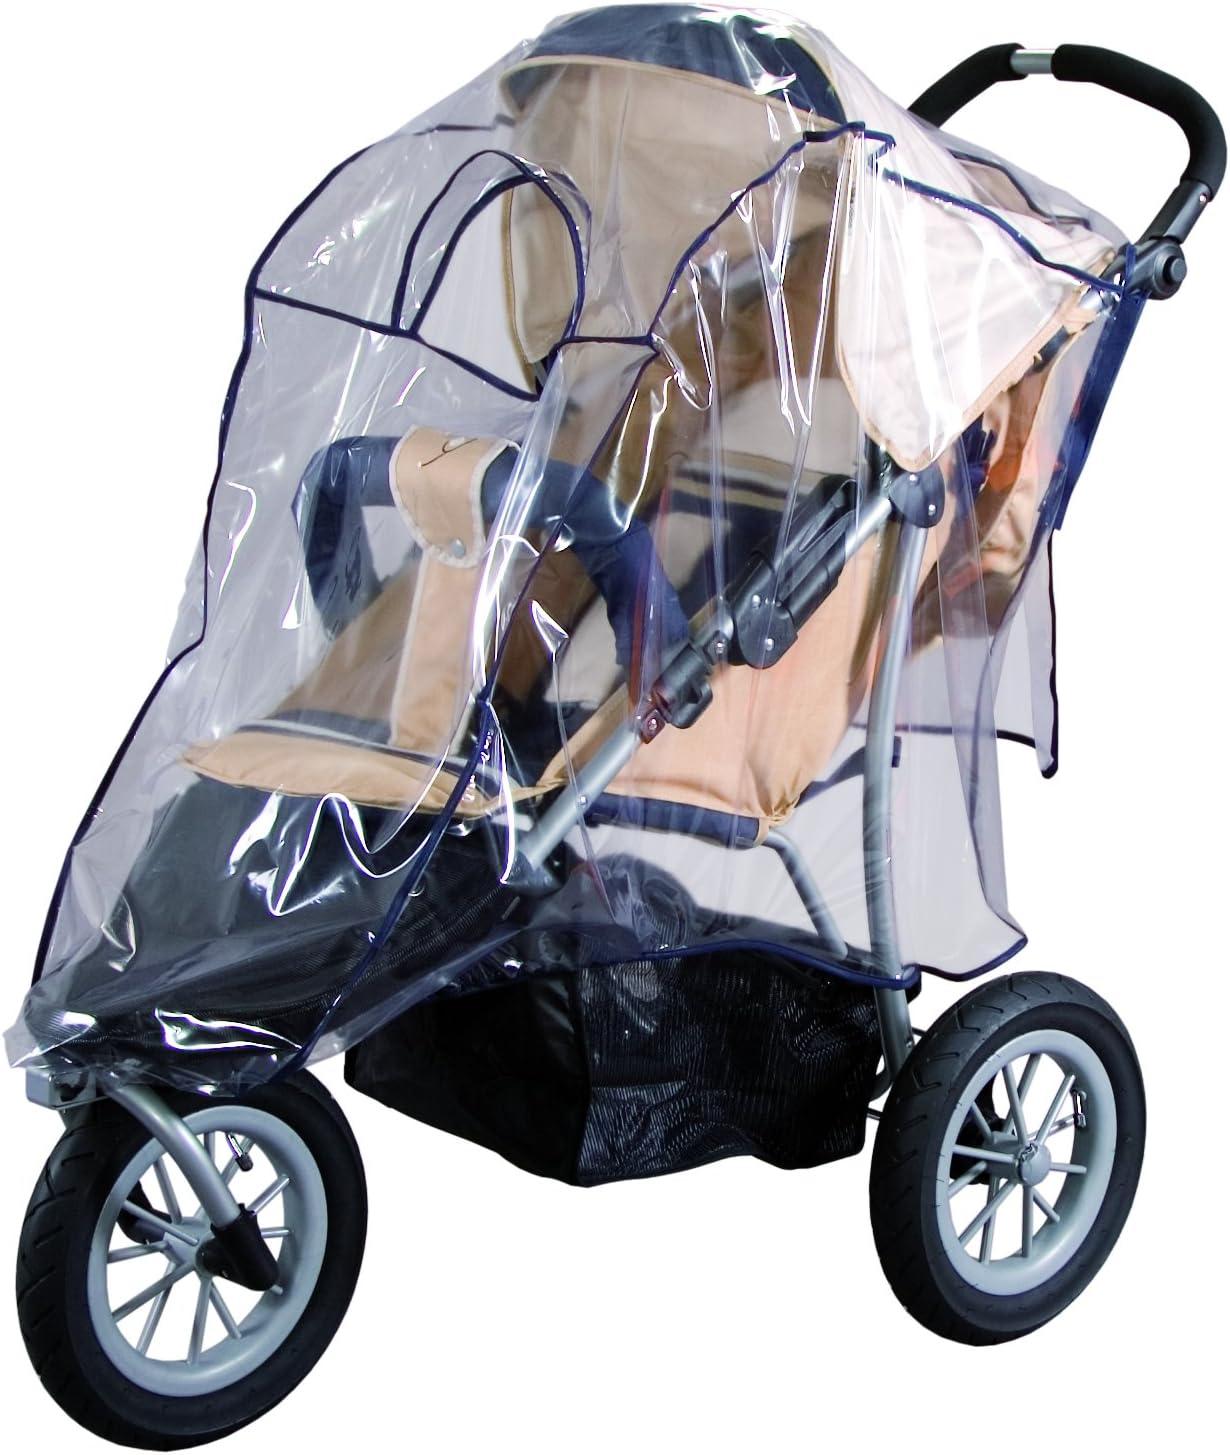 Sunny bebé 10089Lluvia cubierta de protector de pantalla para Jogger (Triciclo de todoterreno), color negro